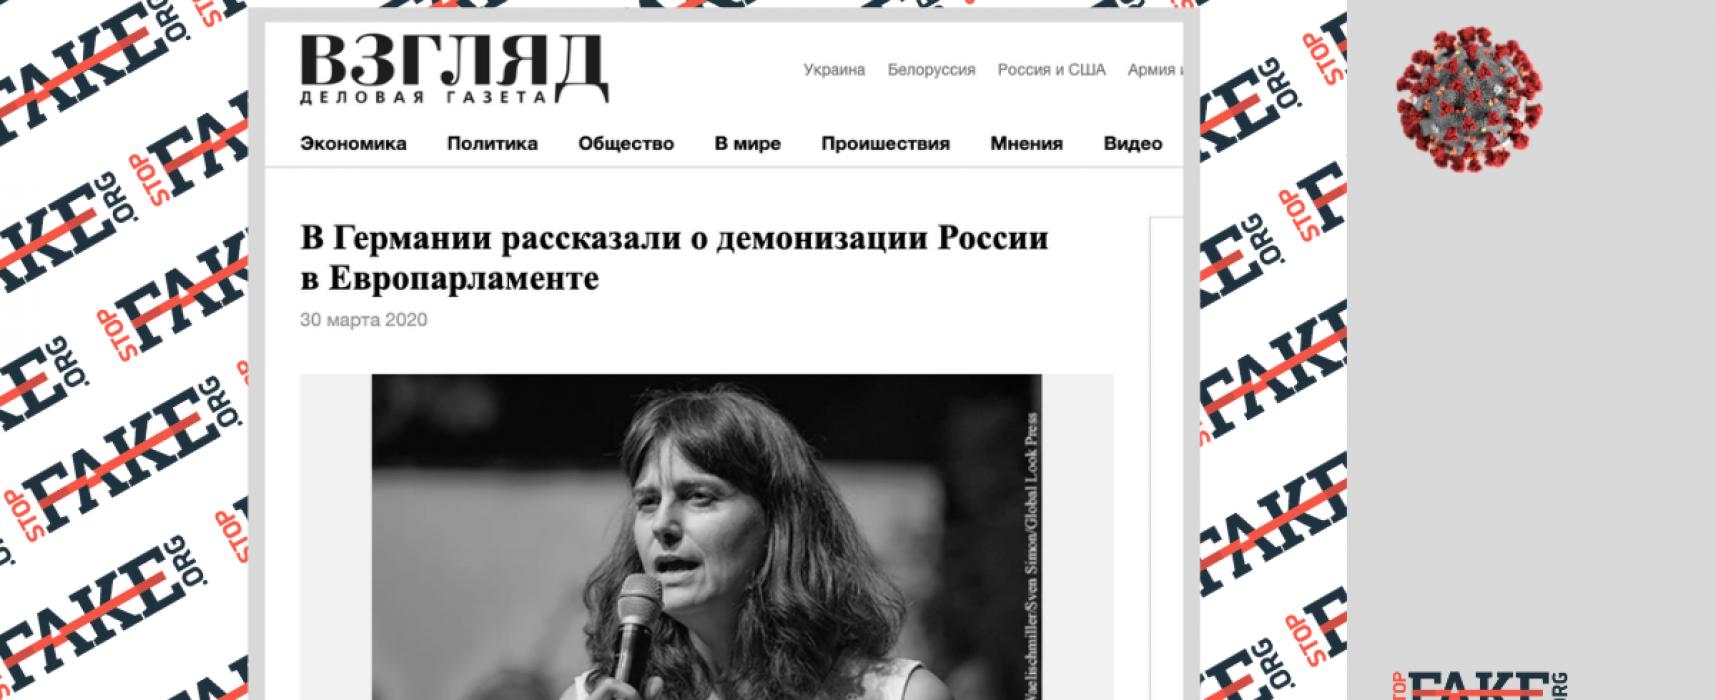 Fake: Accusing Kremlin of Disinformation, EU and US Hide Pandemic Failures